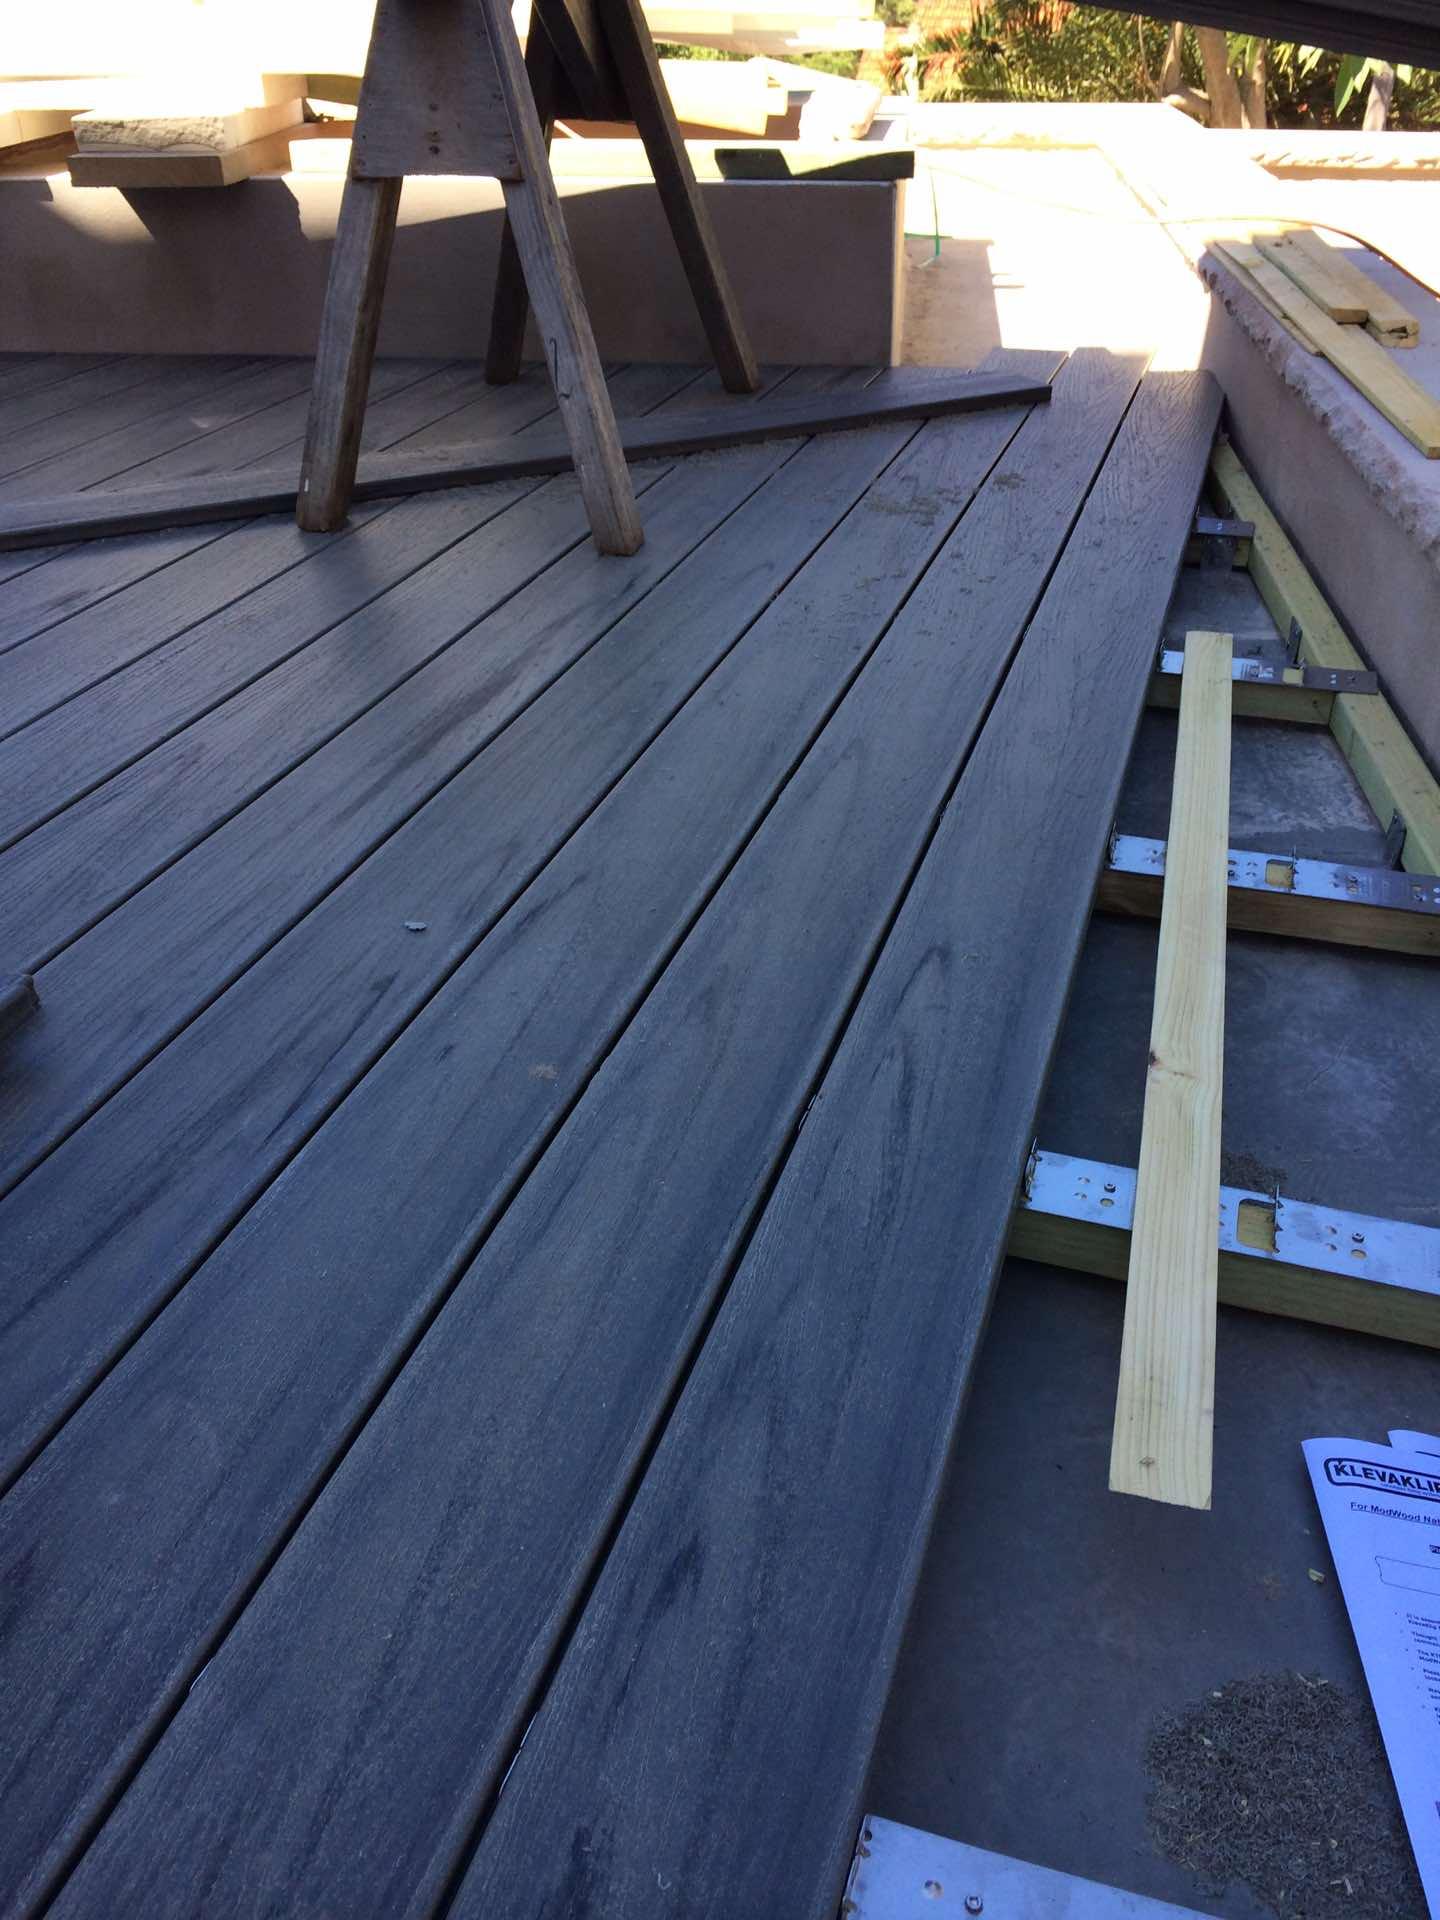 Mod wood deck over concrete garage roof Mosman, NSW